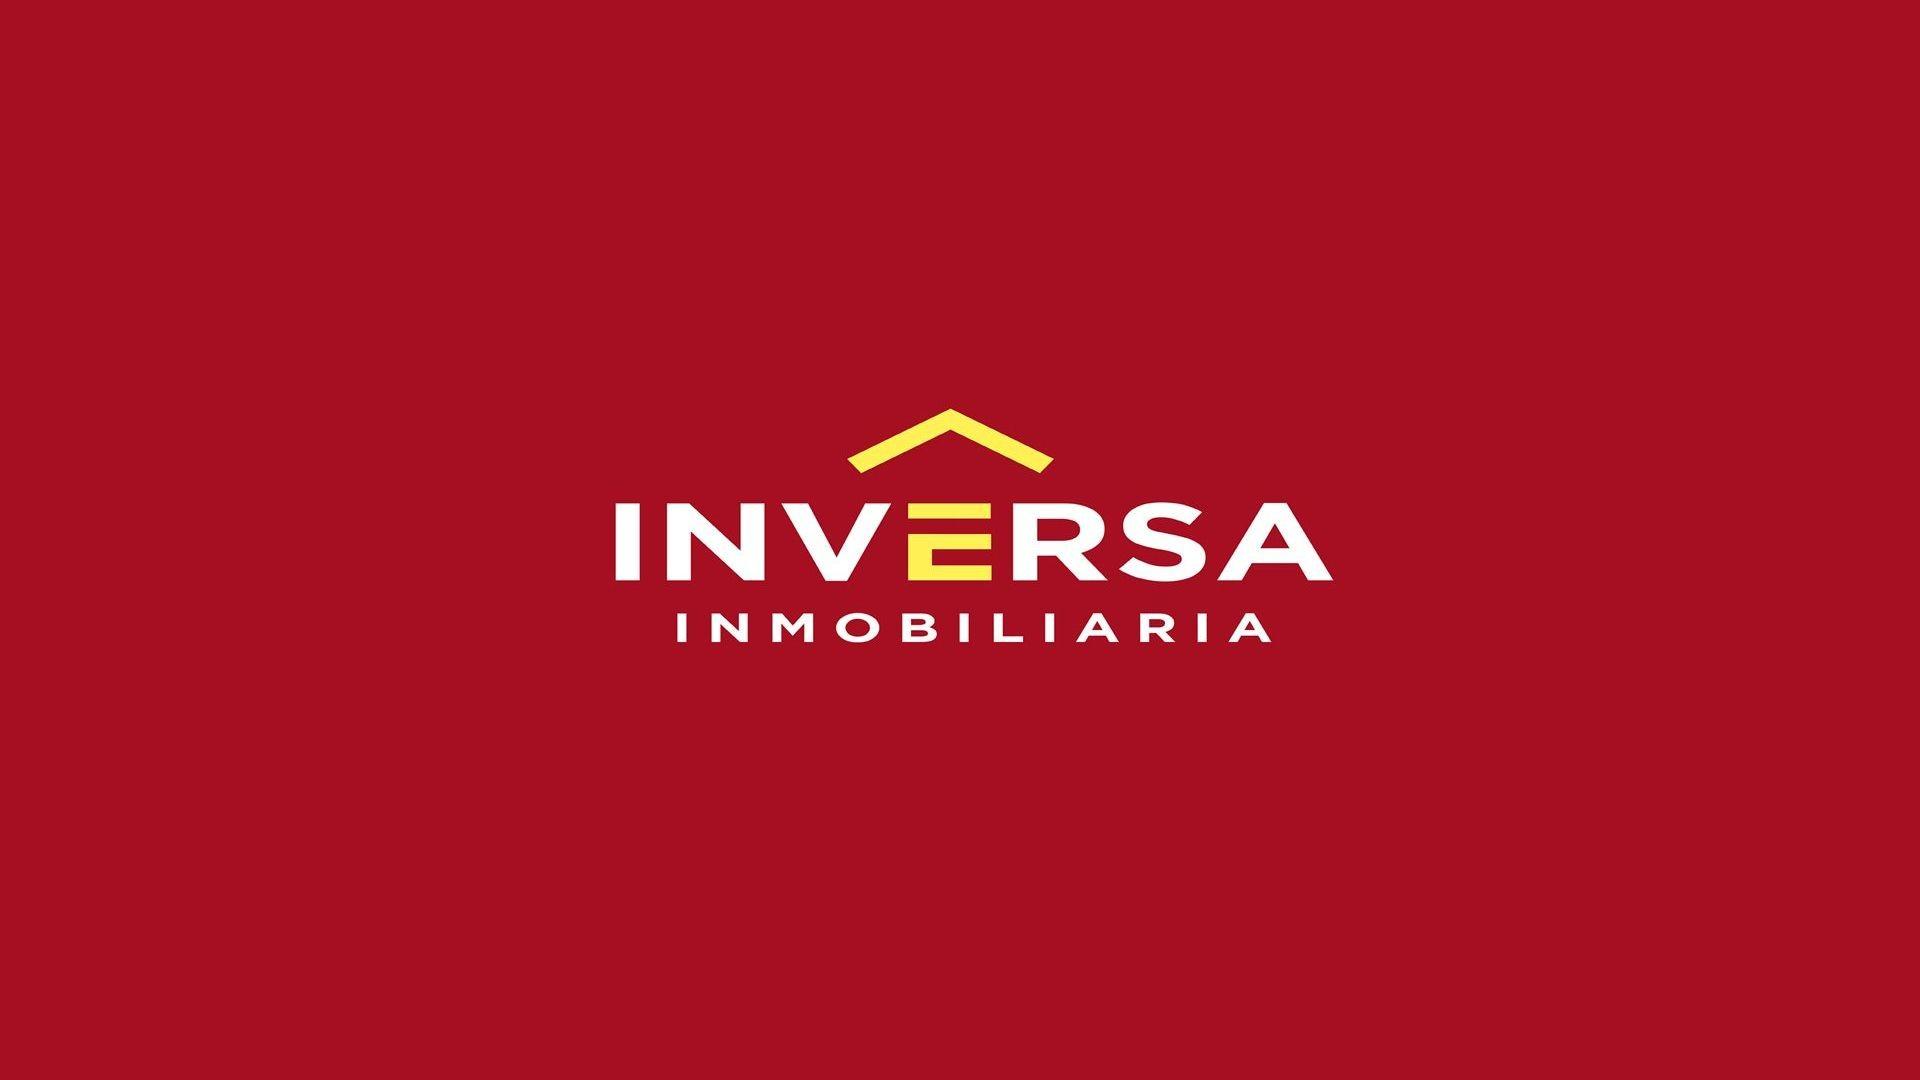 INVERSA INMOBILIARIA